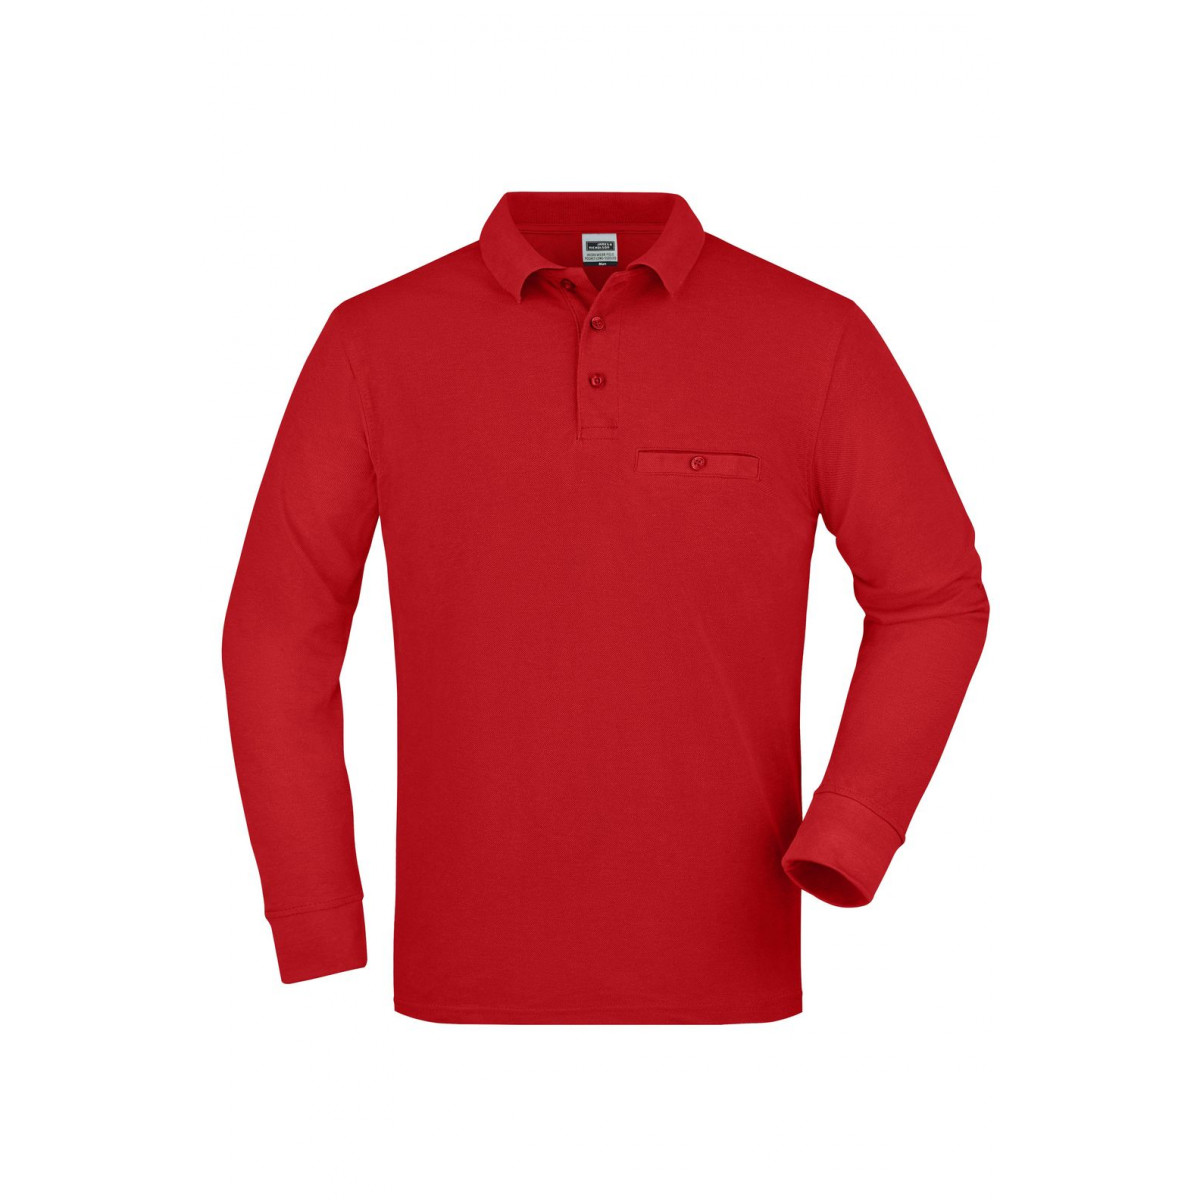 Рубашка поло мужская JN866 Mens Workwear Polo Pocket Longsleeve - Красный